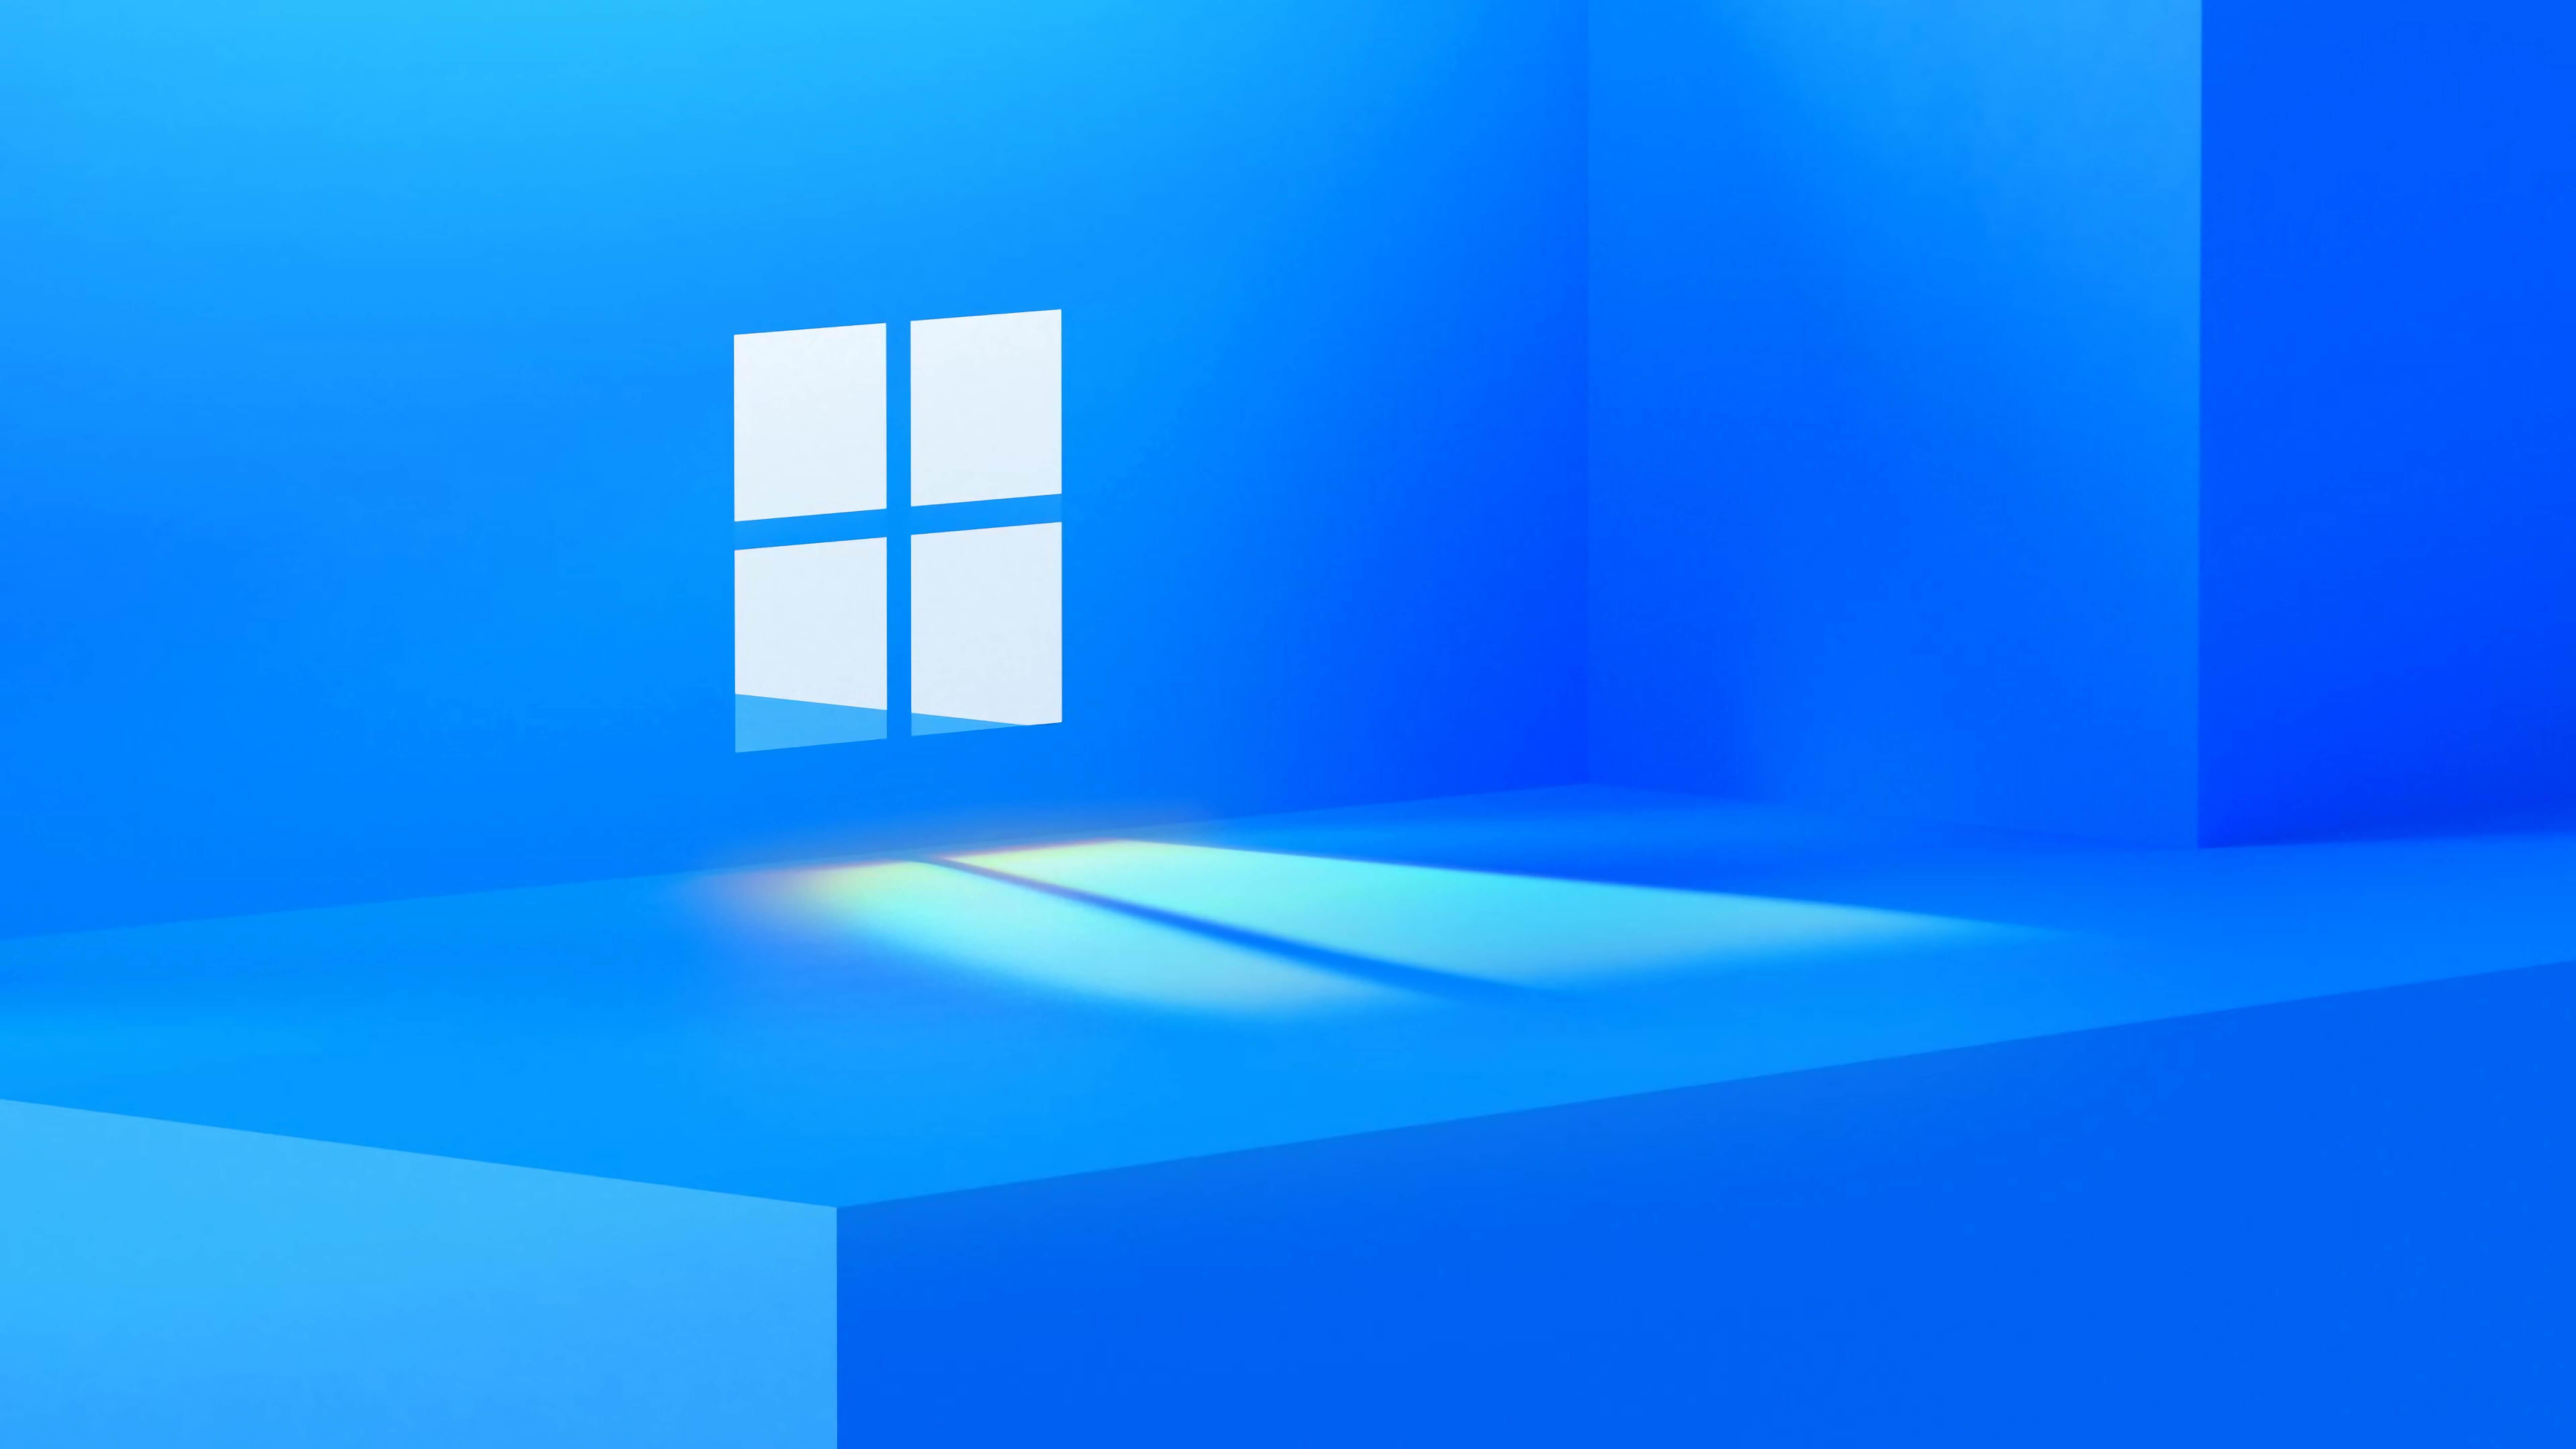 Windows 11的第一张系统高清4K壁纸的照片